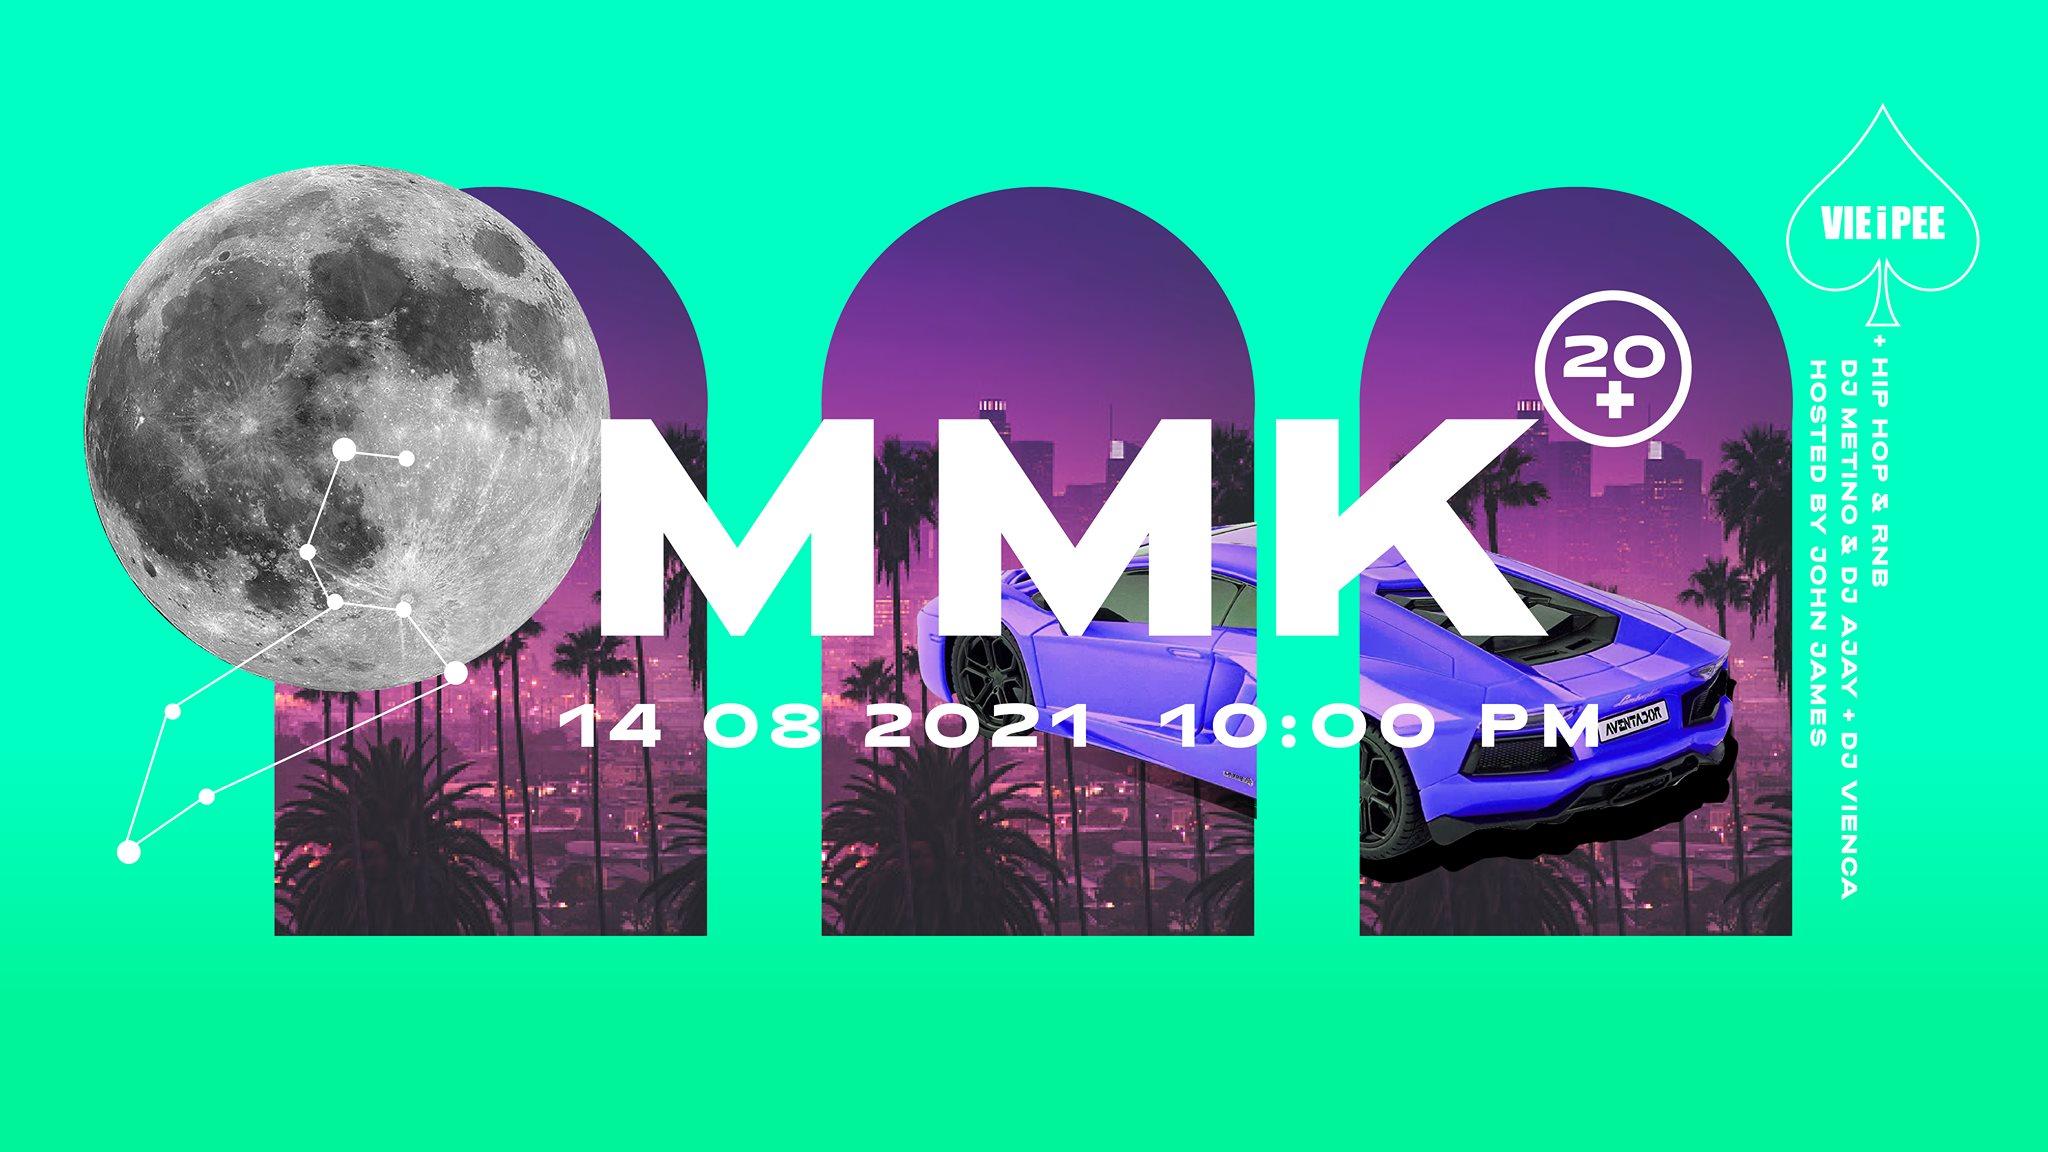 Events Wien: MMK – VIEiPEE Saturday Night Primetime